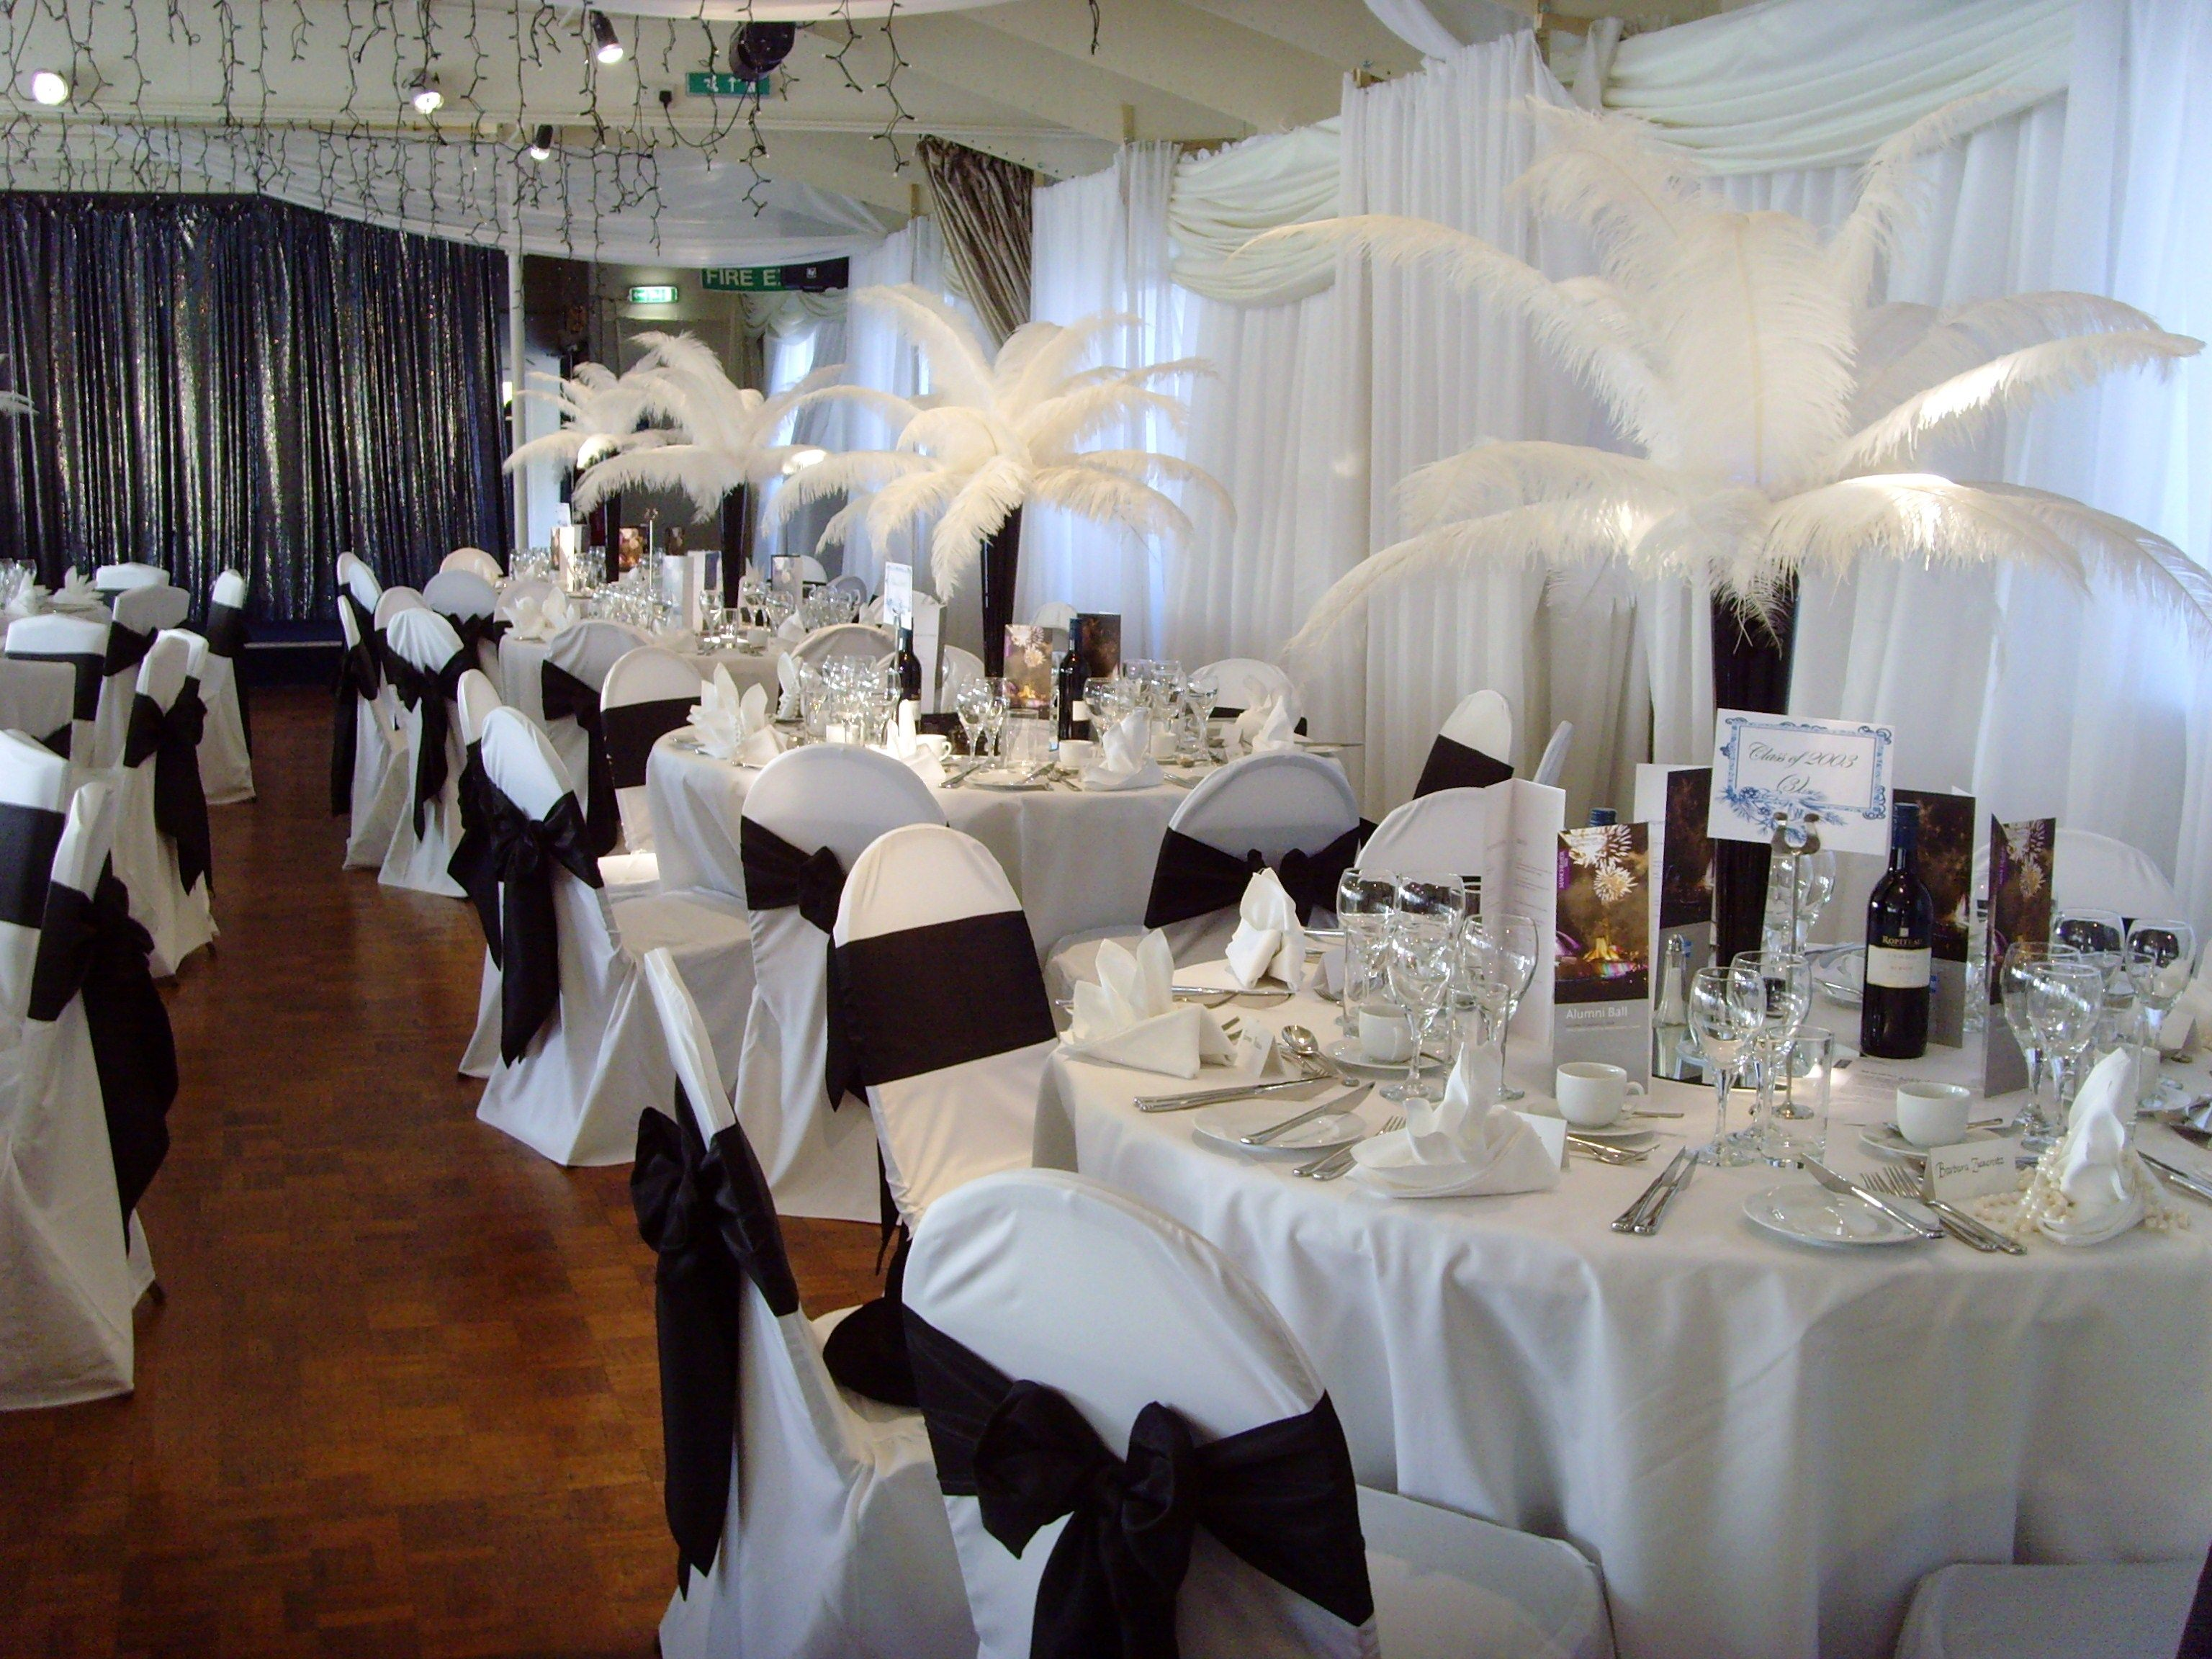 Centerpiece Feathers Fun Wedding Decor Wedding Room Decorations Cheap Wedding Decorations